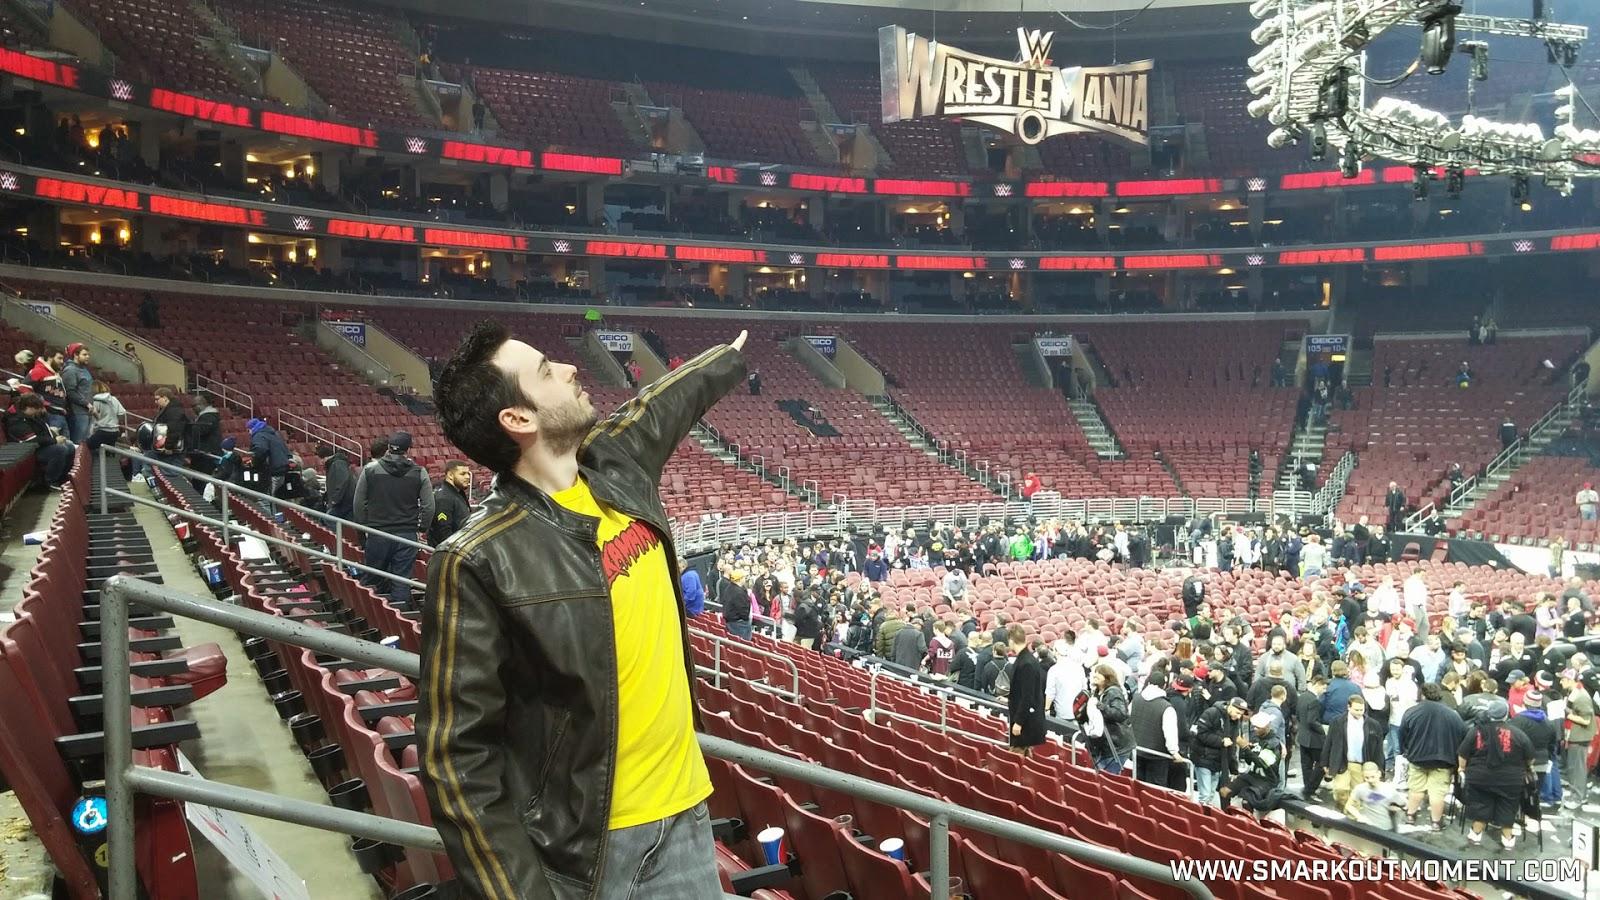 WWE Royal Rumble 2015 pyro WrestleMania sign